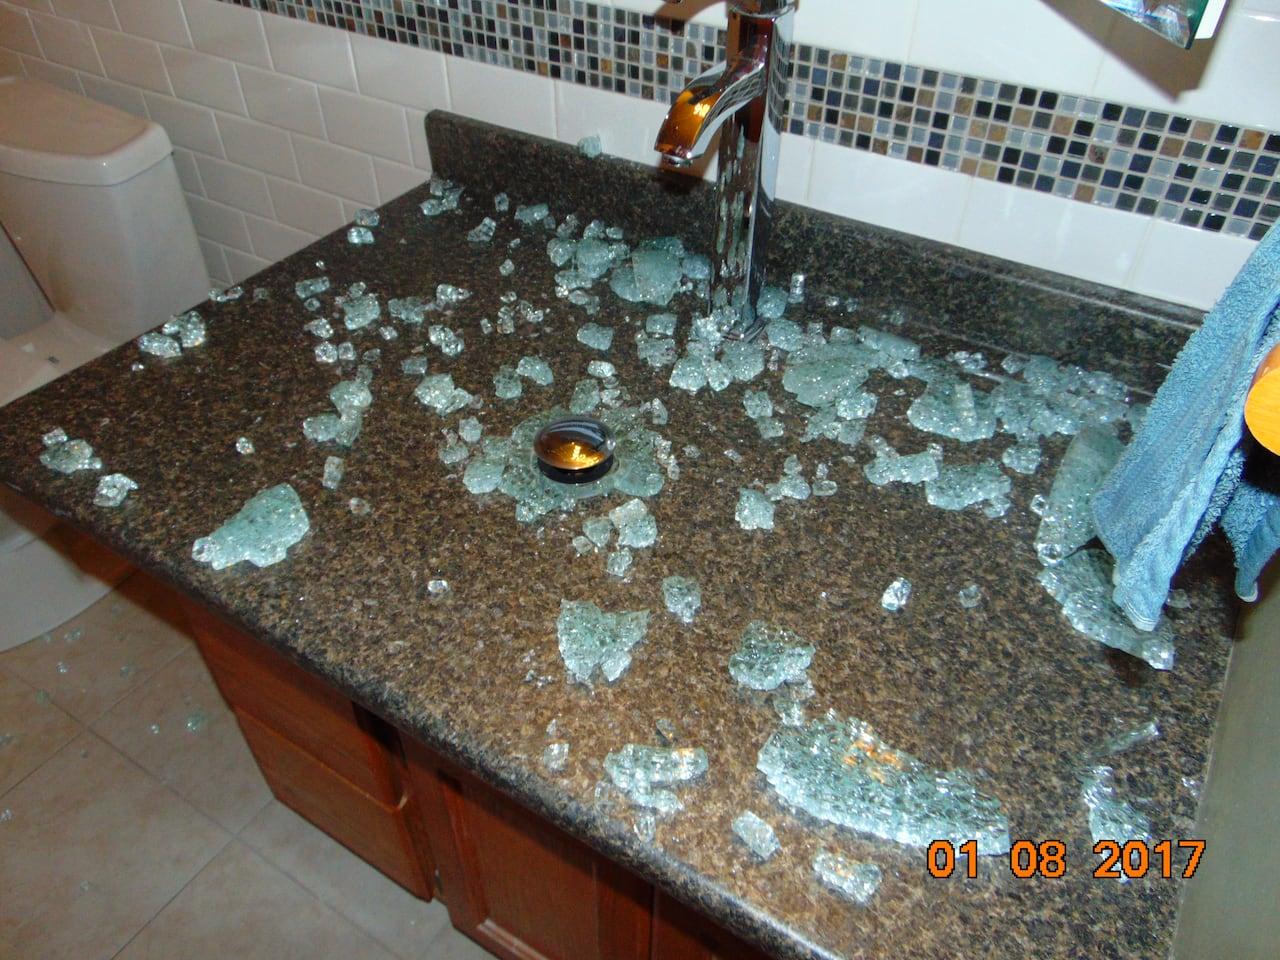 Pleasing B C Family Says Their Glass Bathroom Sink Spontaneously Download Free Architecture Designs Scobabritishbridgeorg